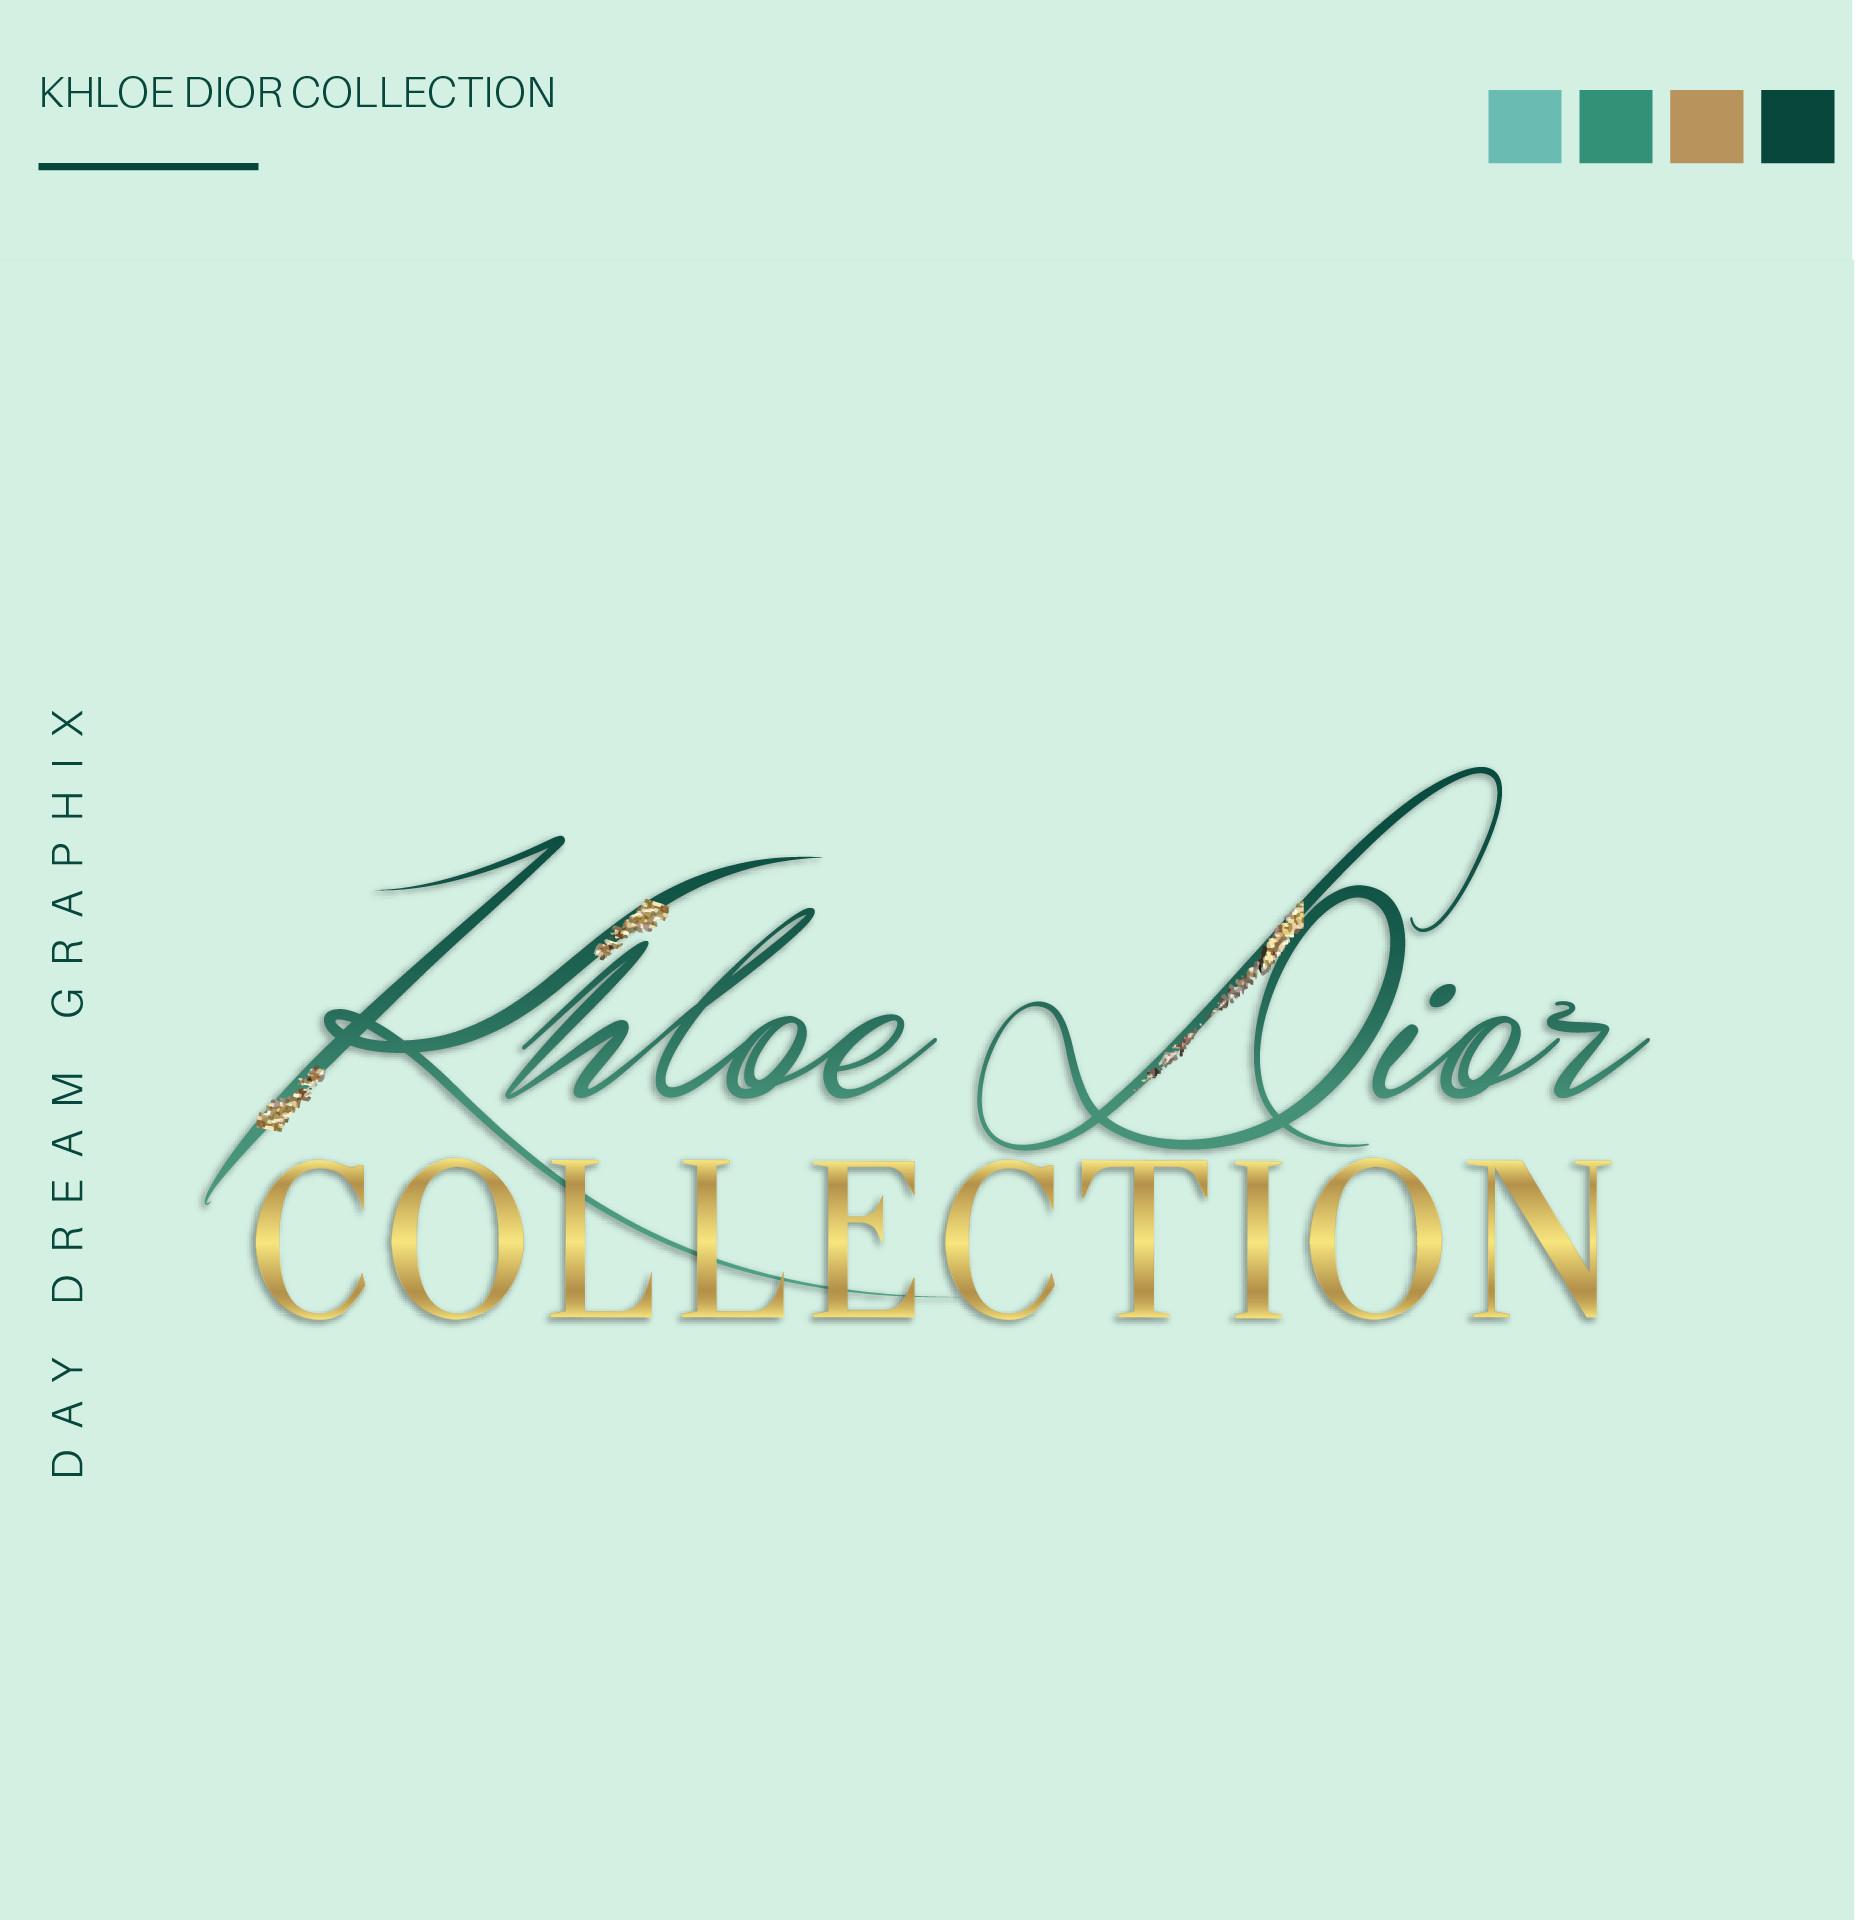 Khloe Dior Collection Logo-04.jpg